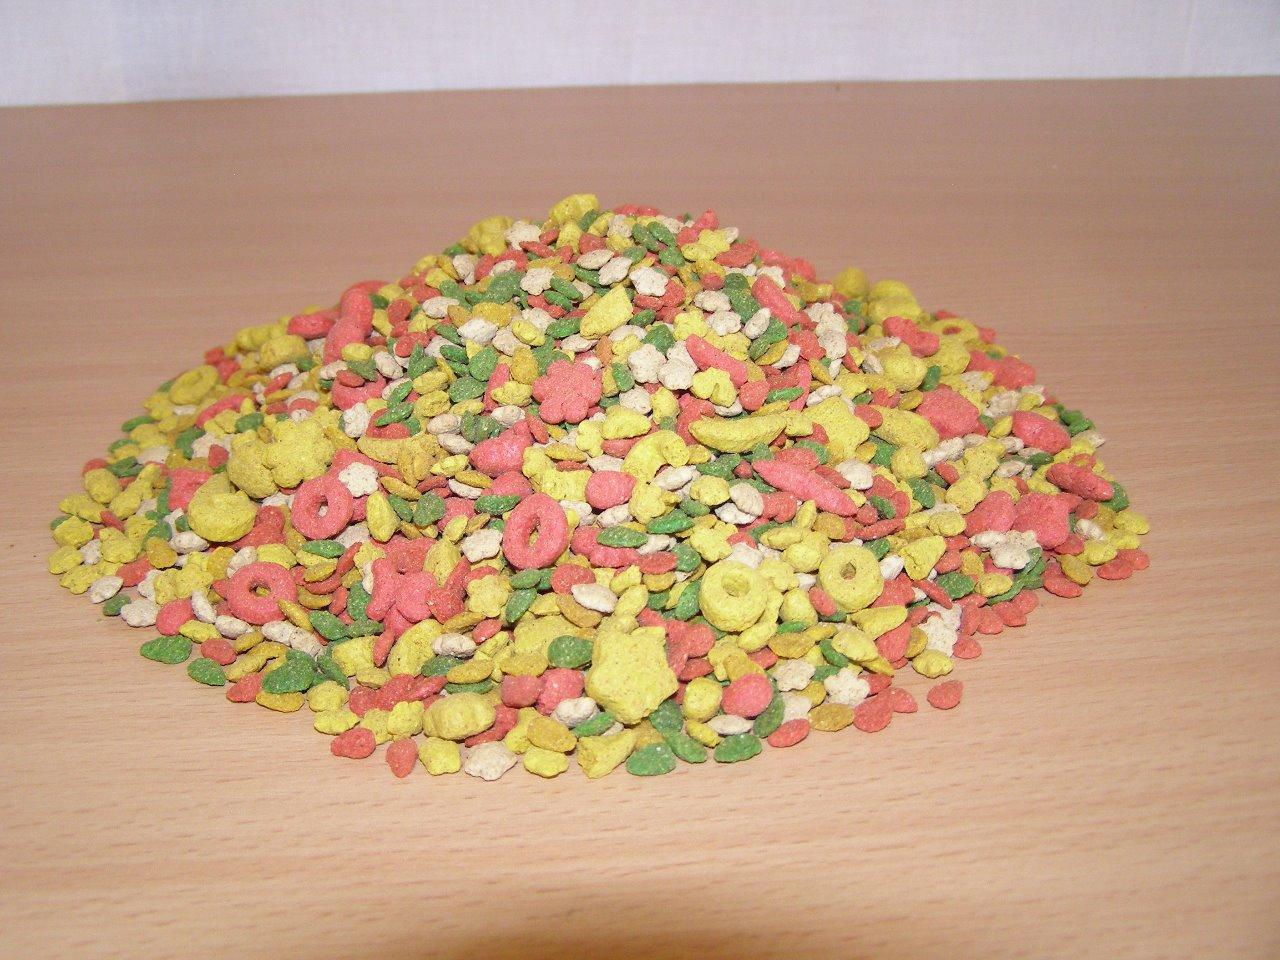 Kaytee Products Granule Exact Rainbow Parrot s DHA 1kg